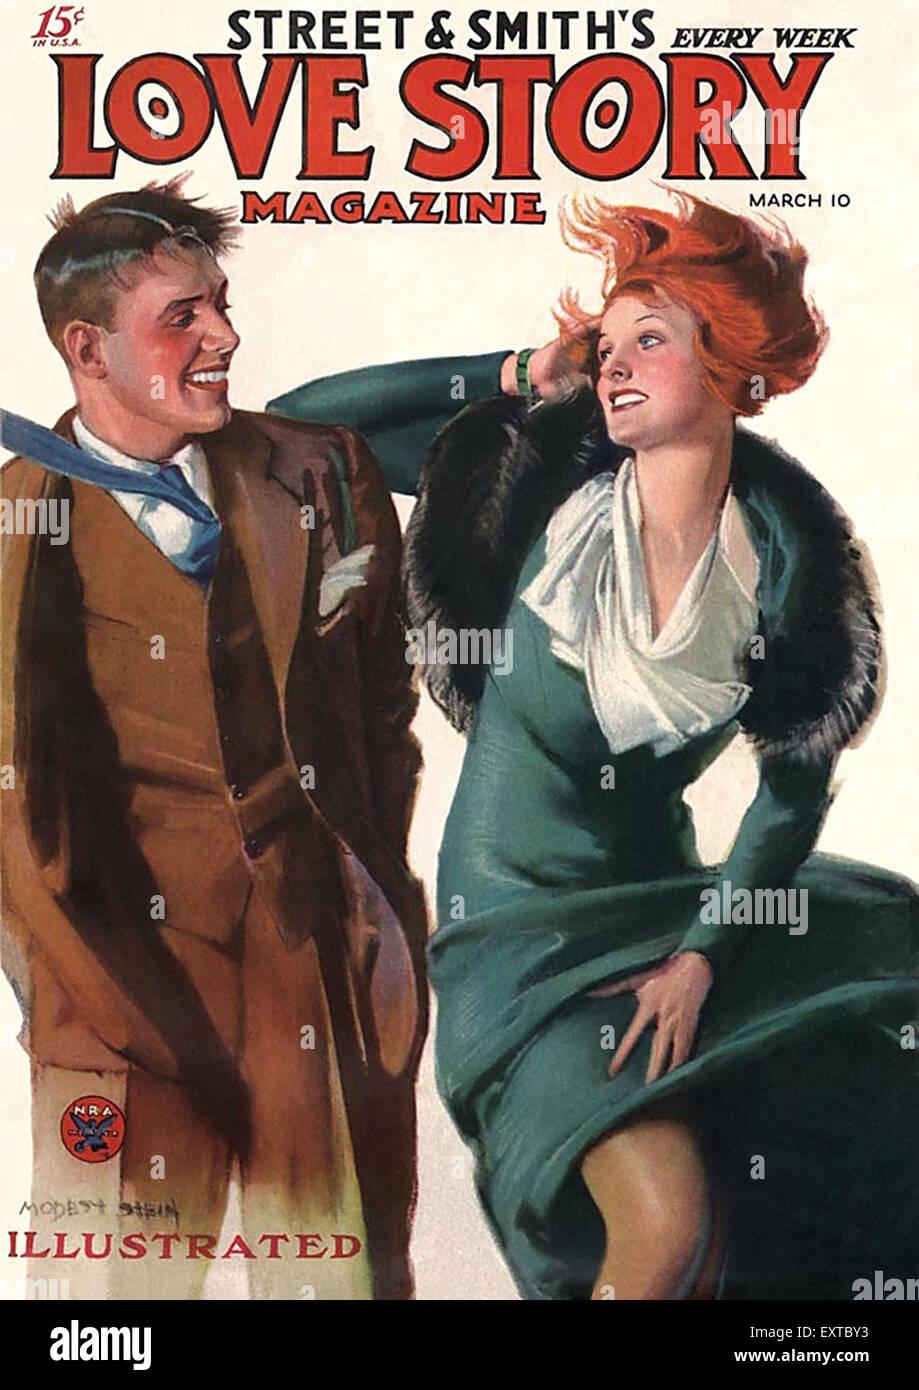 1930s USA Love Story Magazine Cover - Stock Image